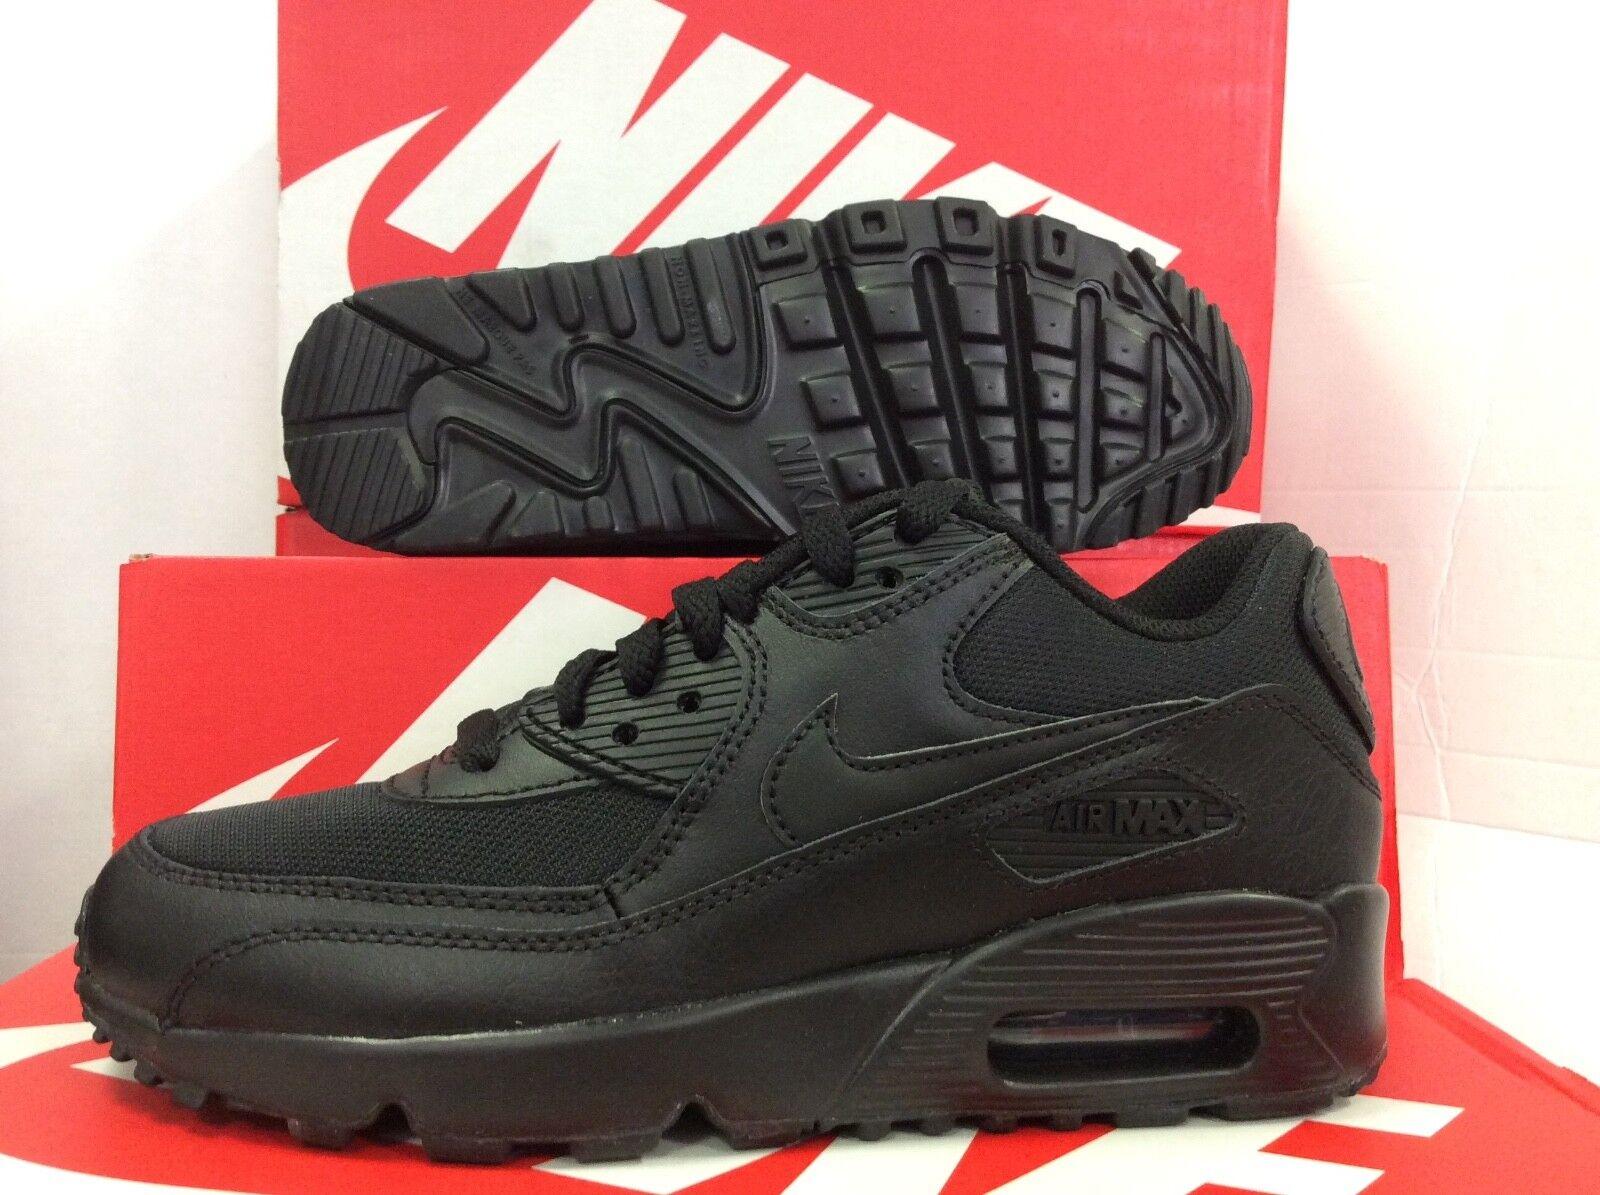 Nike Air Max 90 Mesh GS Shoes Black Trainers 833418 001 Classic Skyline UK 3 5